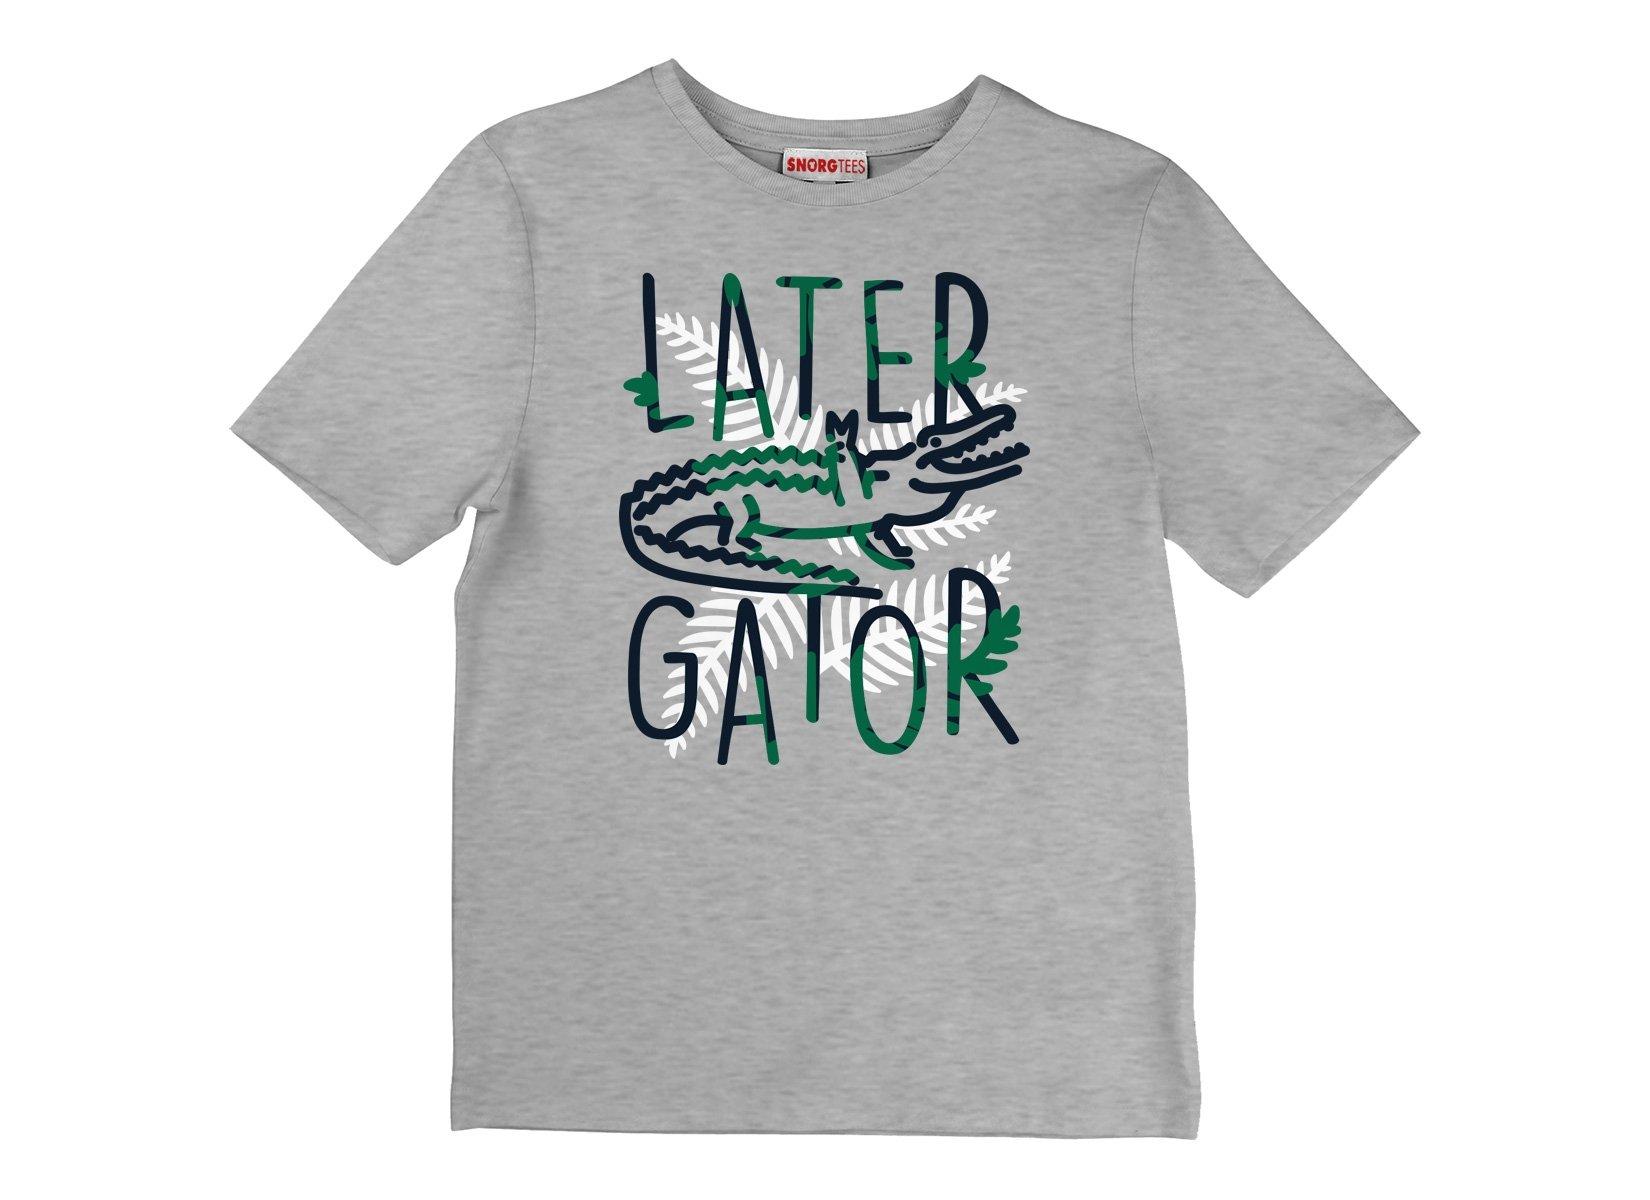 Later Gator on Kids T-Shirt